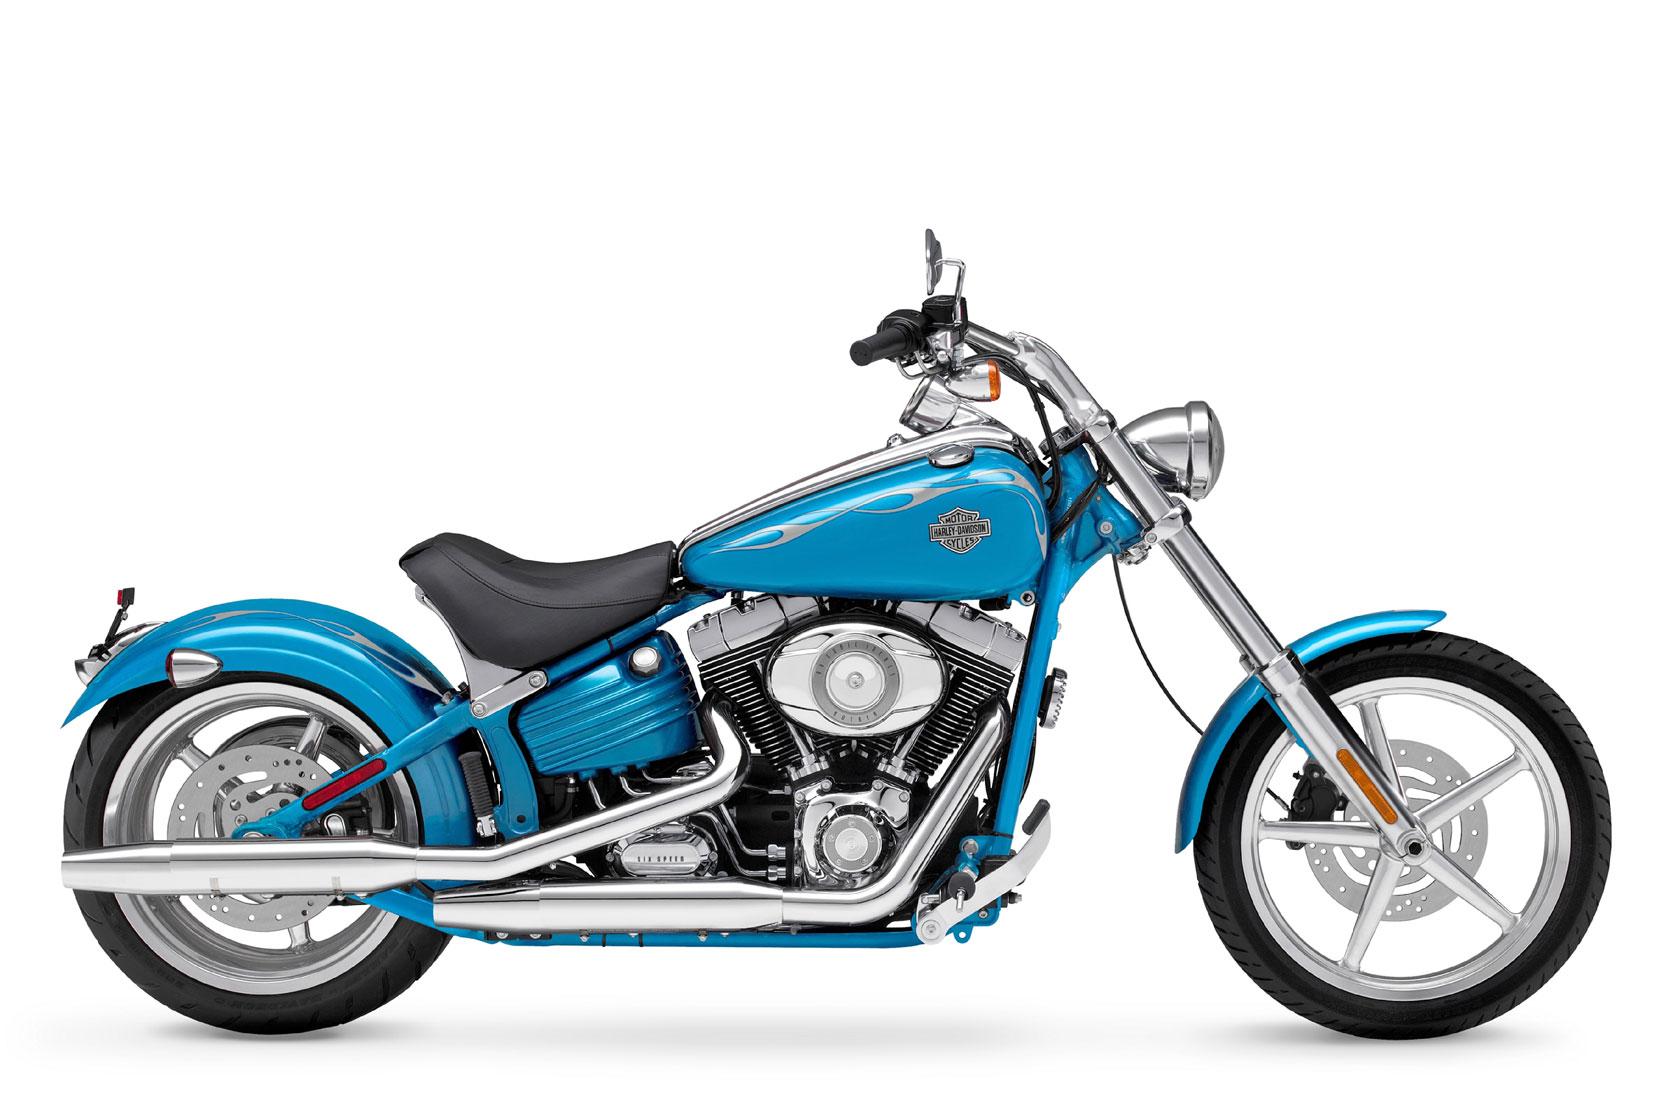 Harley Davidson Black Rocker Covers